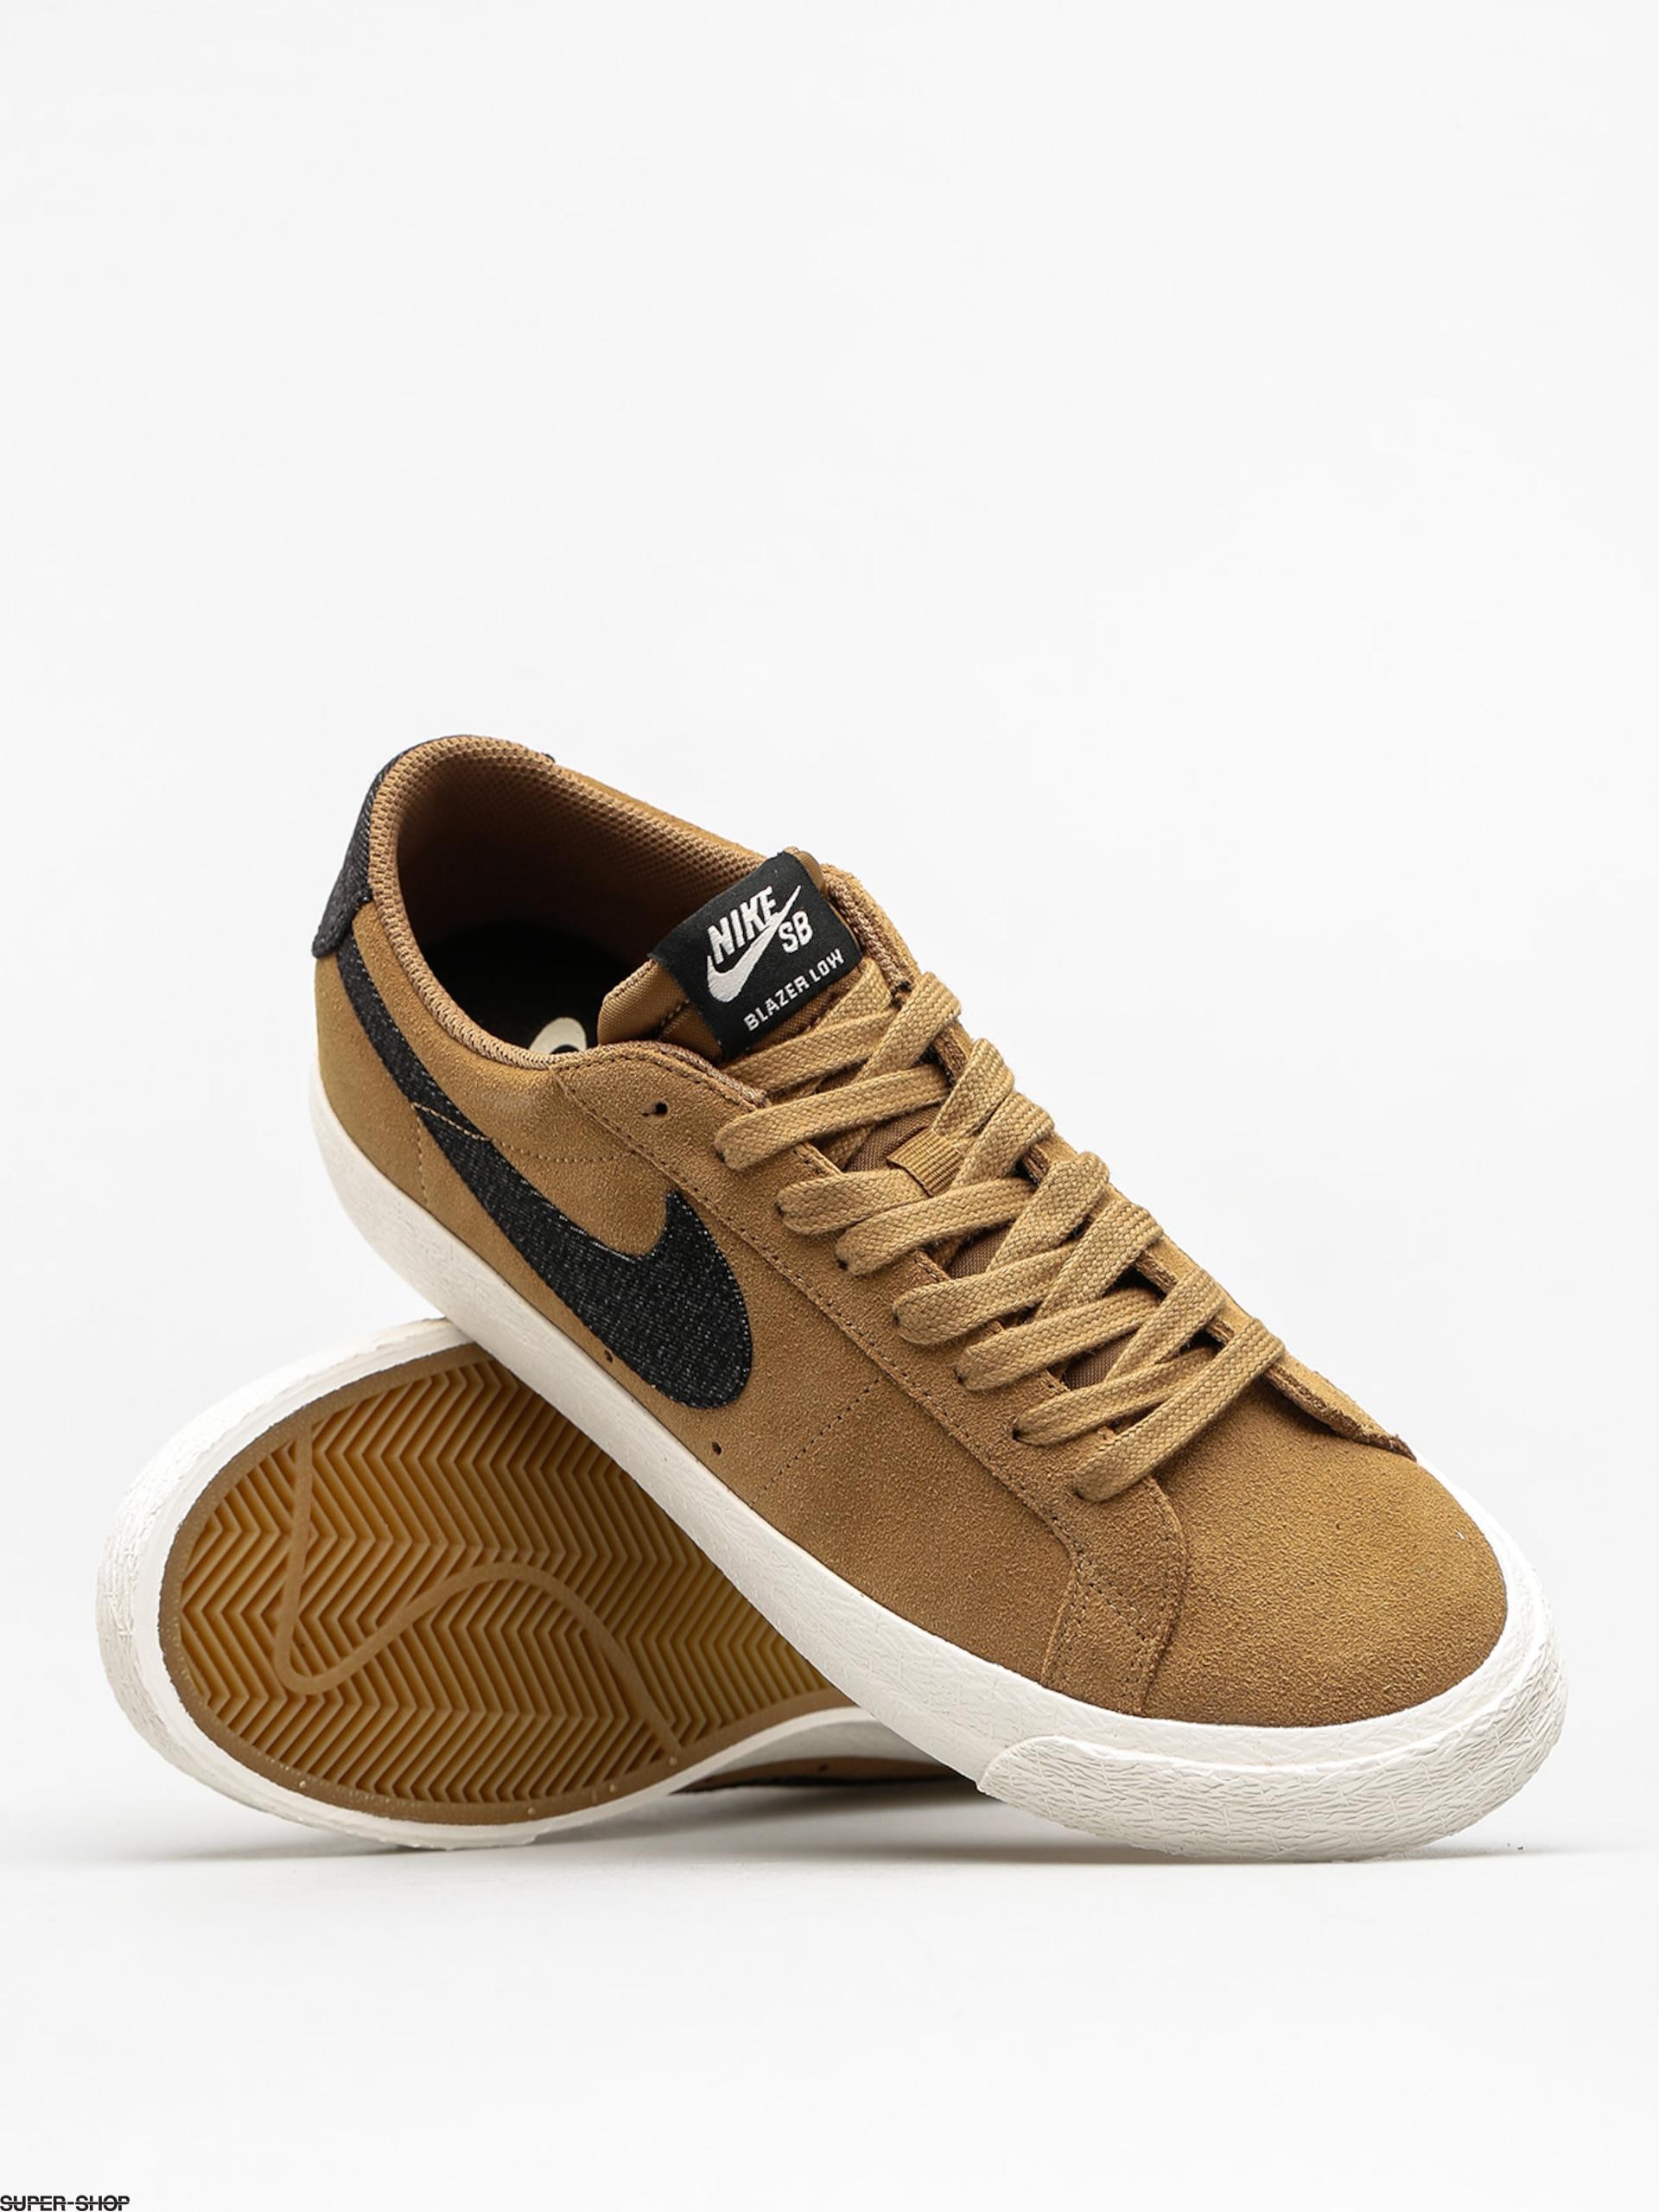 Nike SB Shoes Zoom Blazer Low (golden beige/black sail gum light brown)